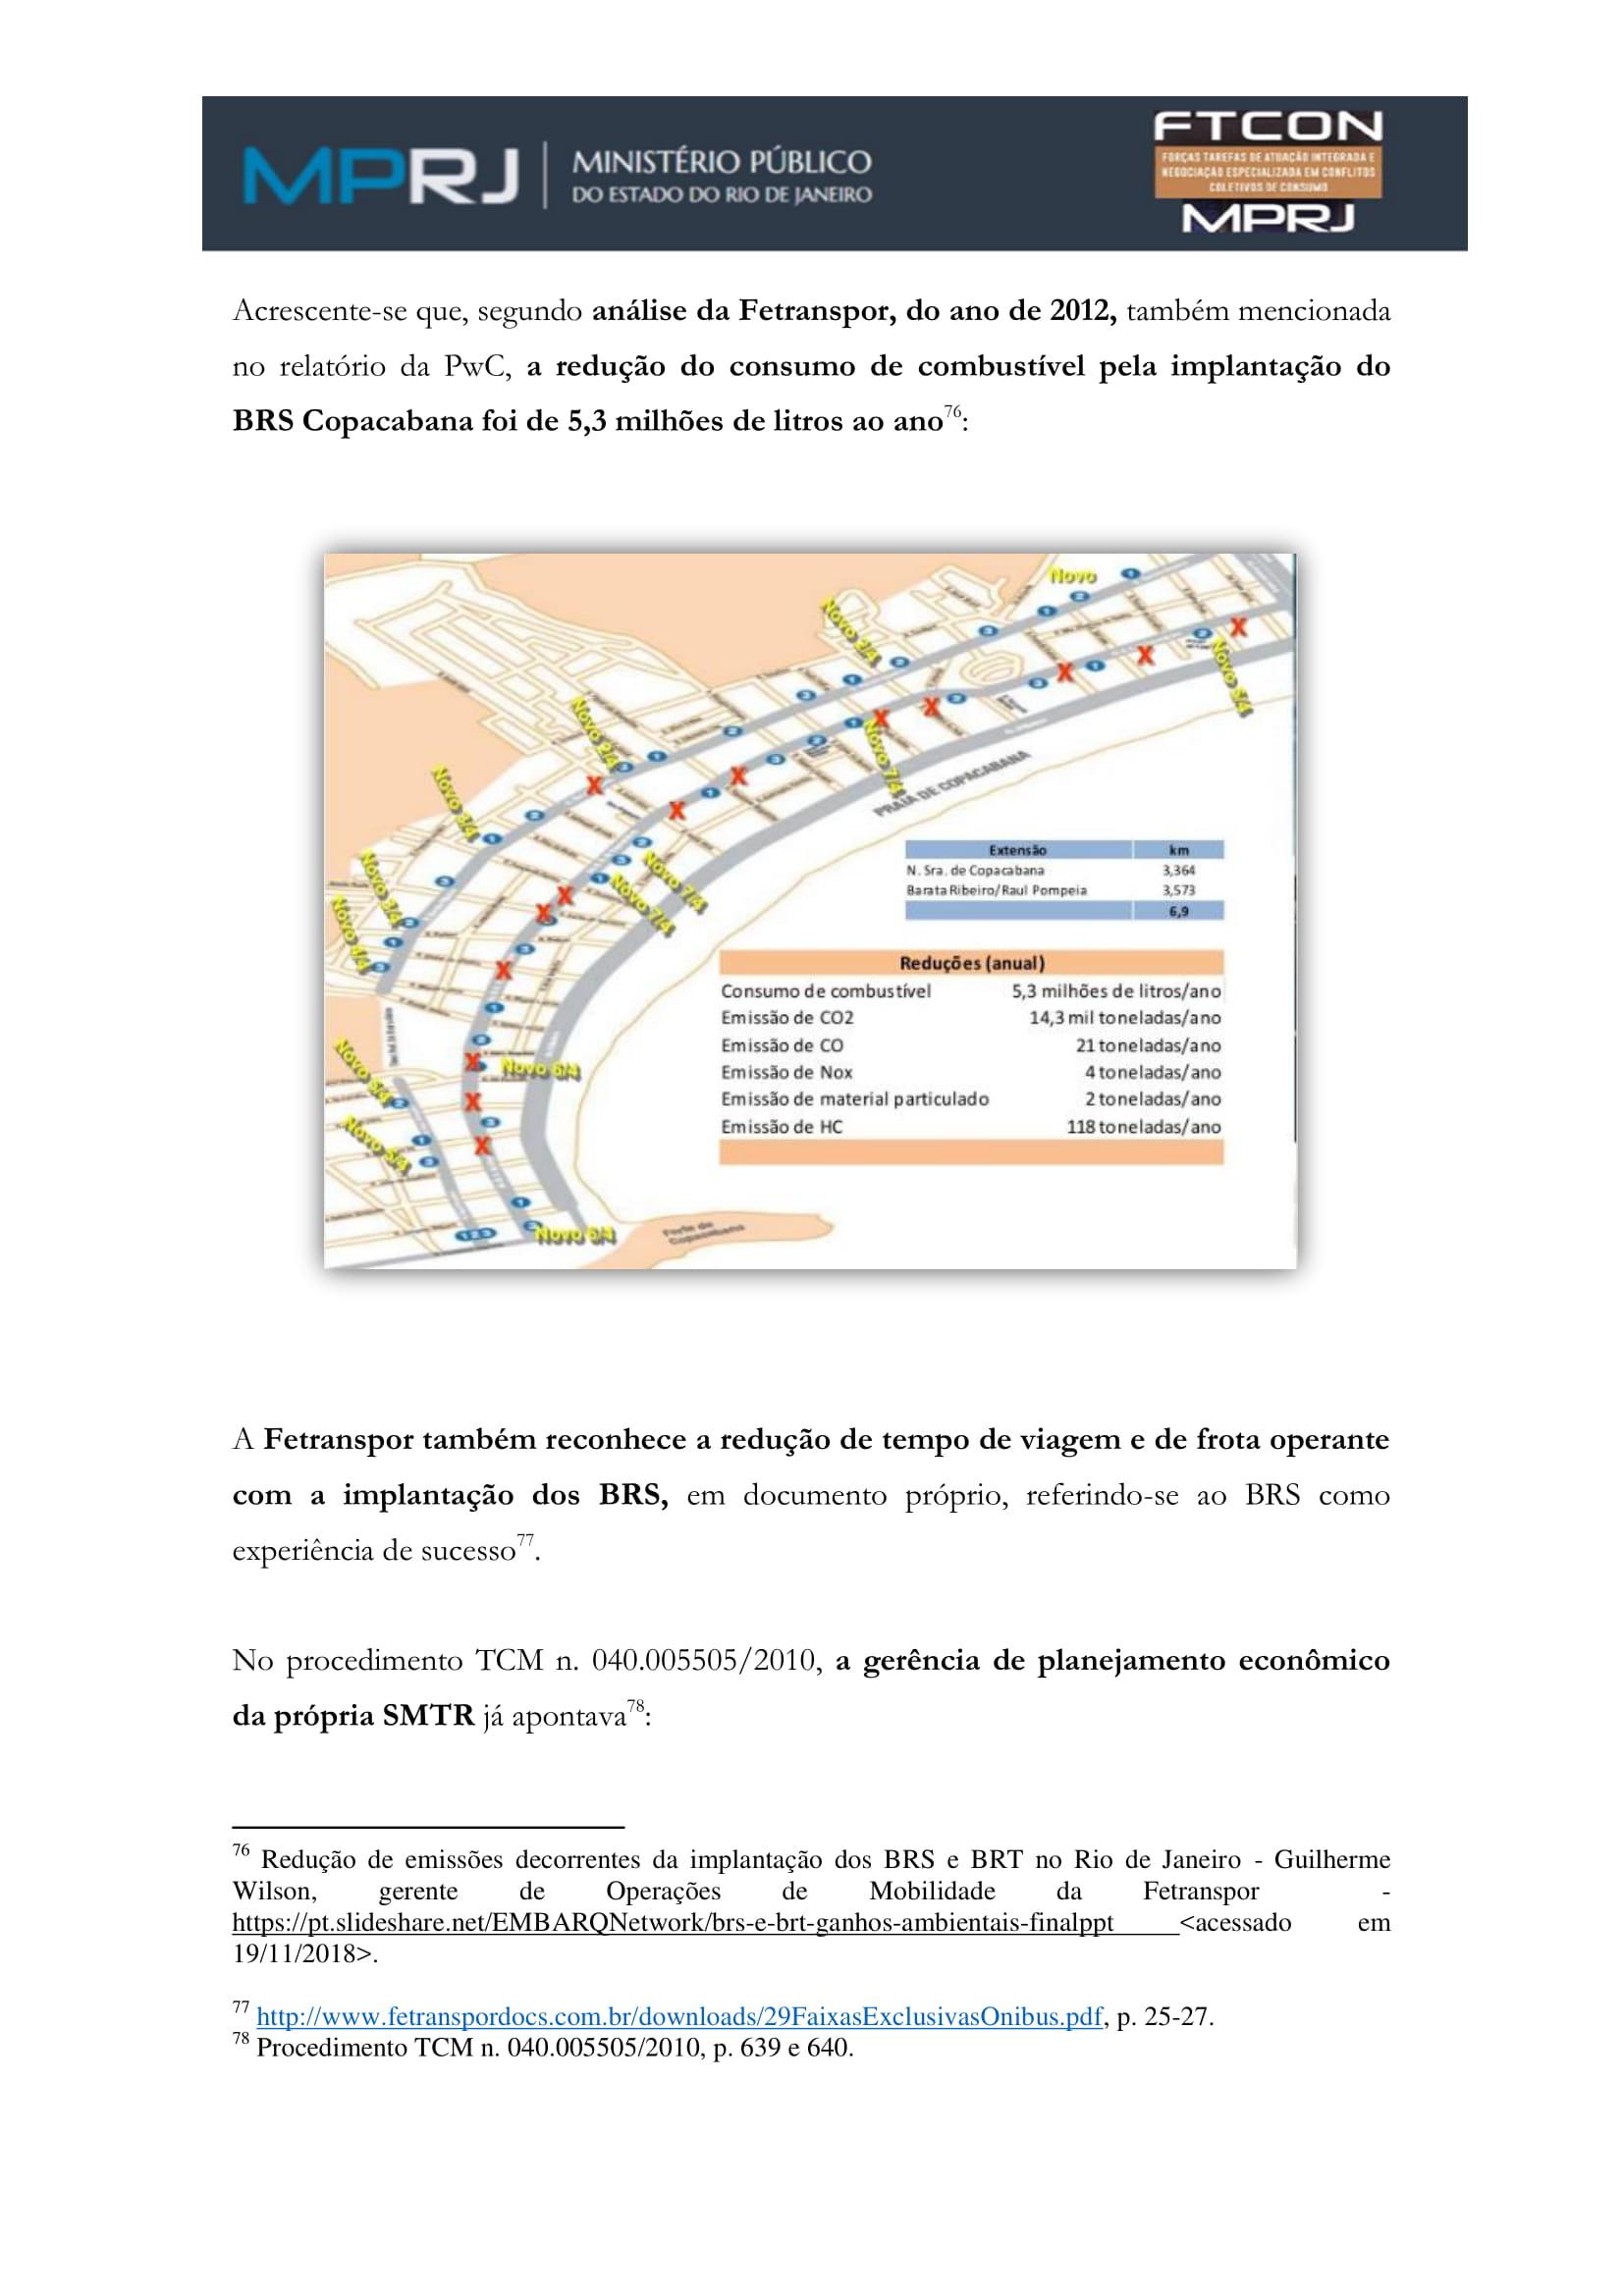 acp_caducidade_onibus_dr_rt-085